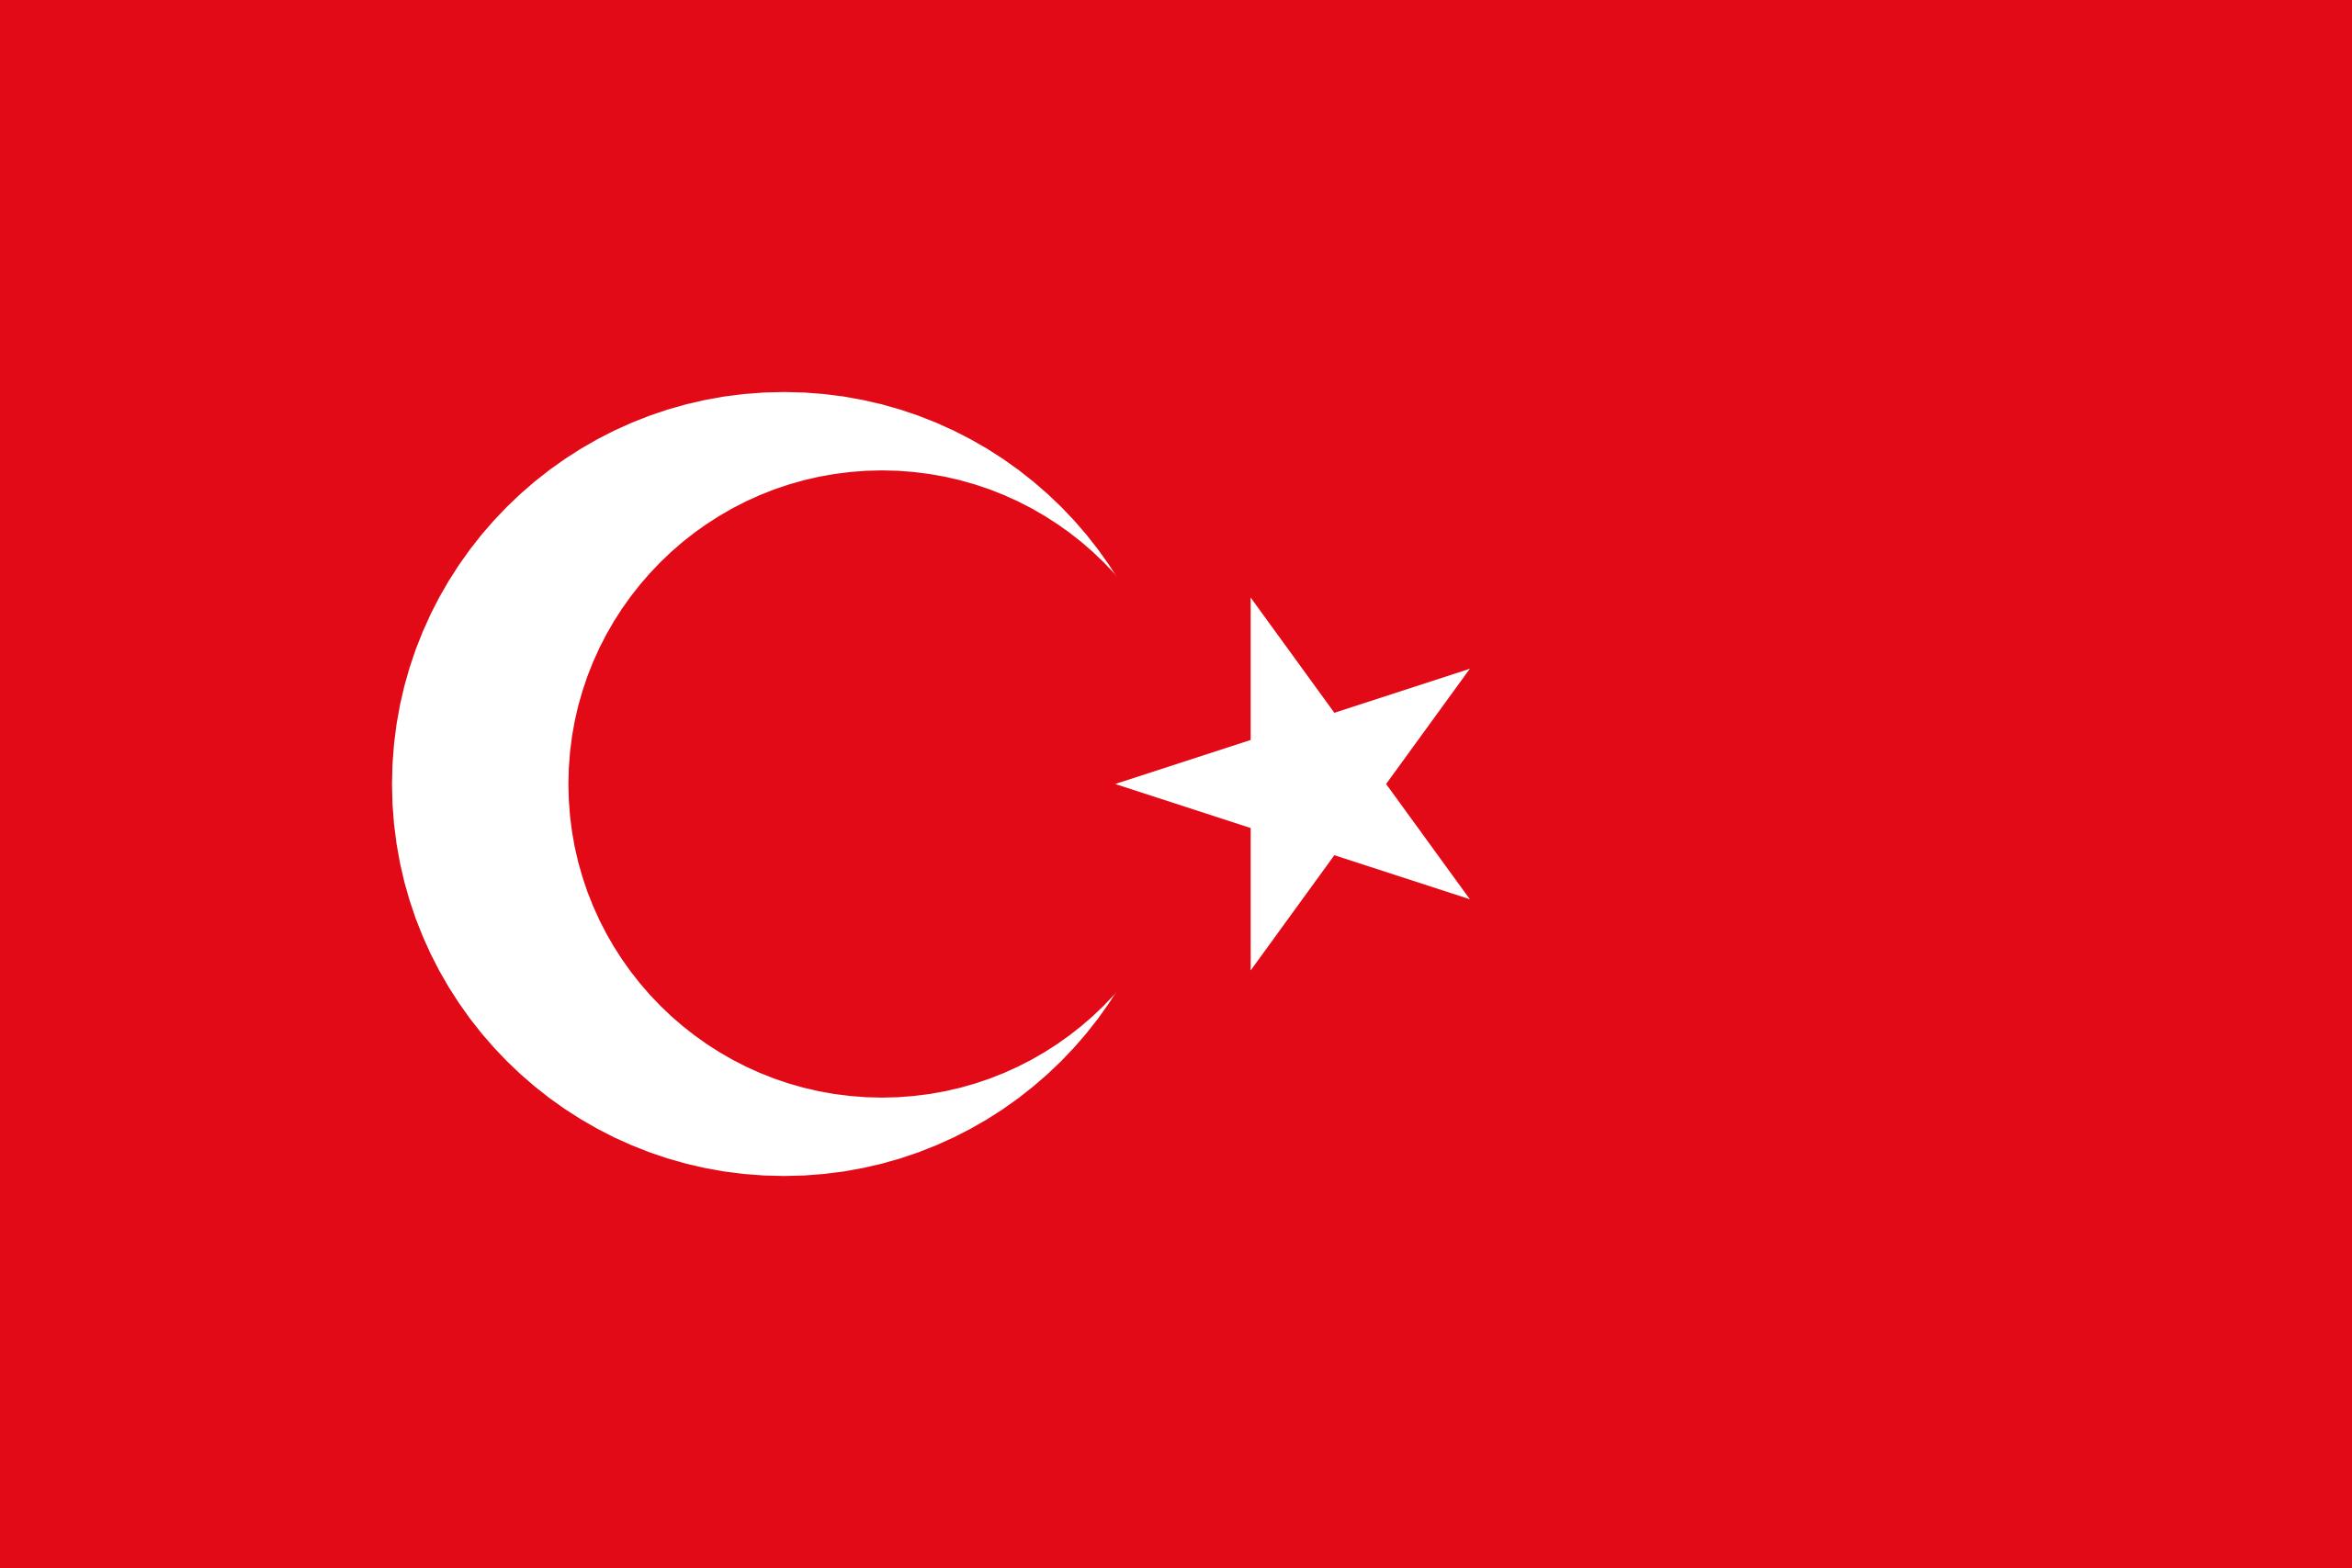 turquía, 国家, 会徽, 徽标, 符号 - 高清壁纸 - 教授-falken.com